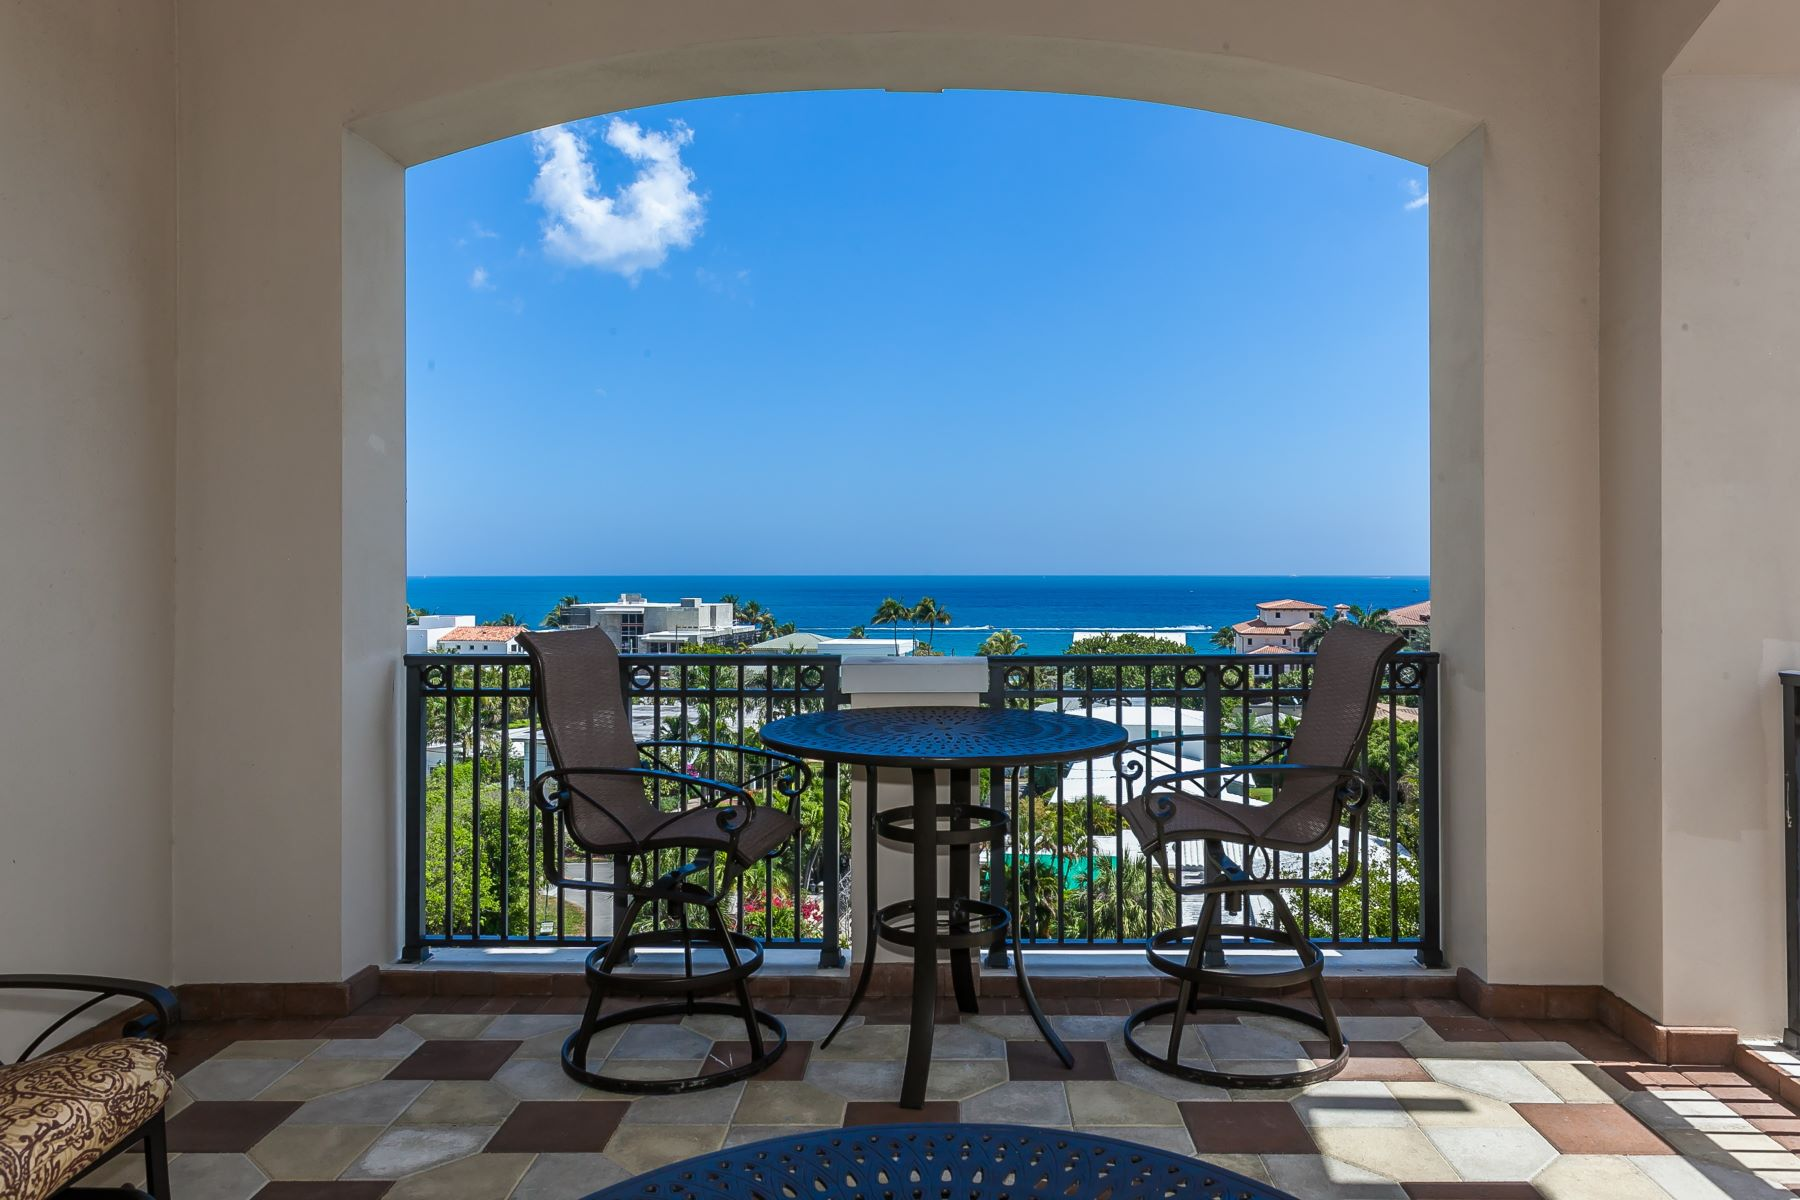 Condominium for Sale at 2409 N Ocean Blvd 2409 N Ocean Blvd 625, Fort Lauderdale, Florida, 33305 United States